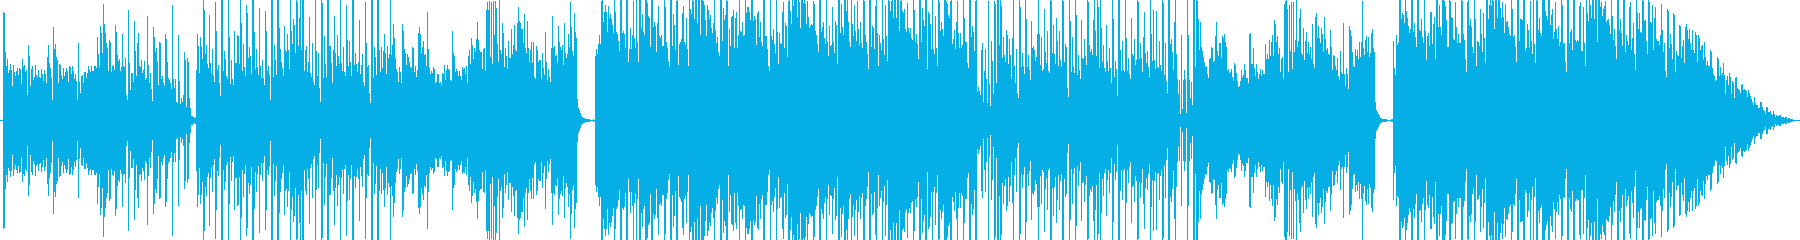 Kpop ワイルドスピードっぽい曲の再生済みの波形